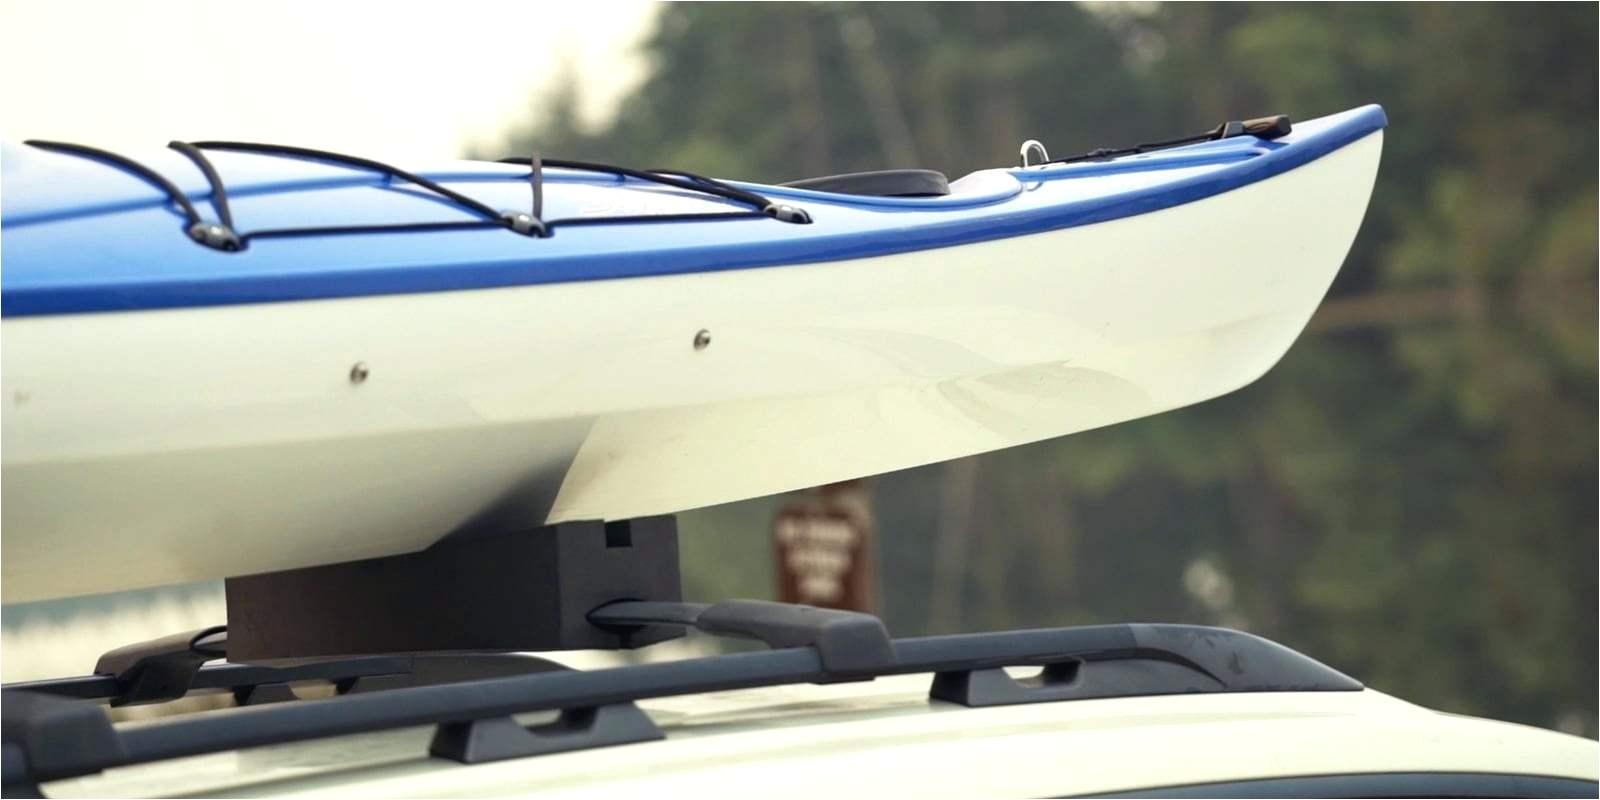 Swiss Gear Double Kayak Roof Rack Double Kayak Roof Rack Diy Swiss Gear Thule